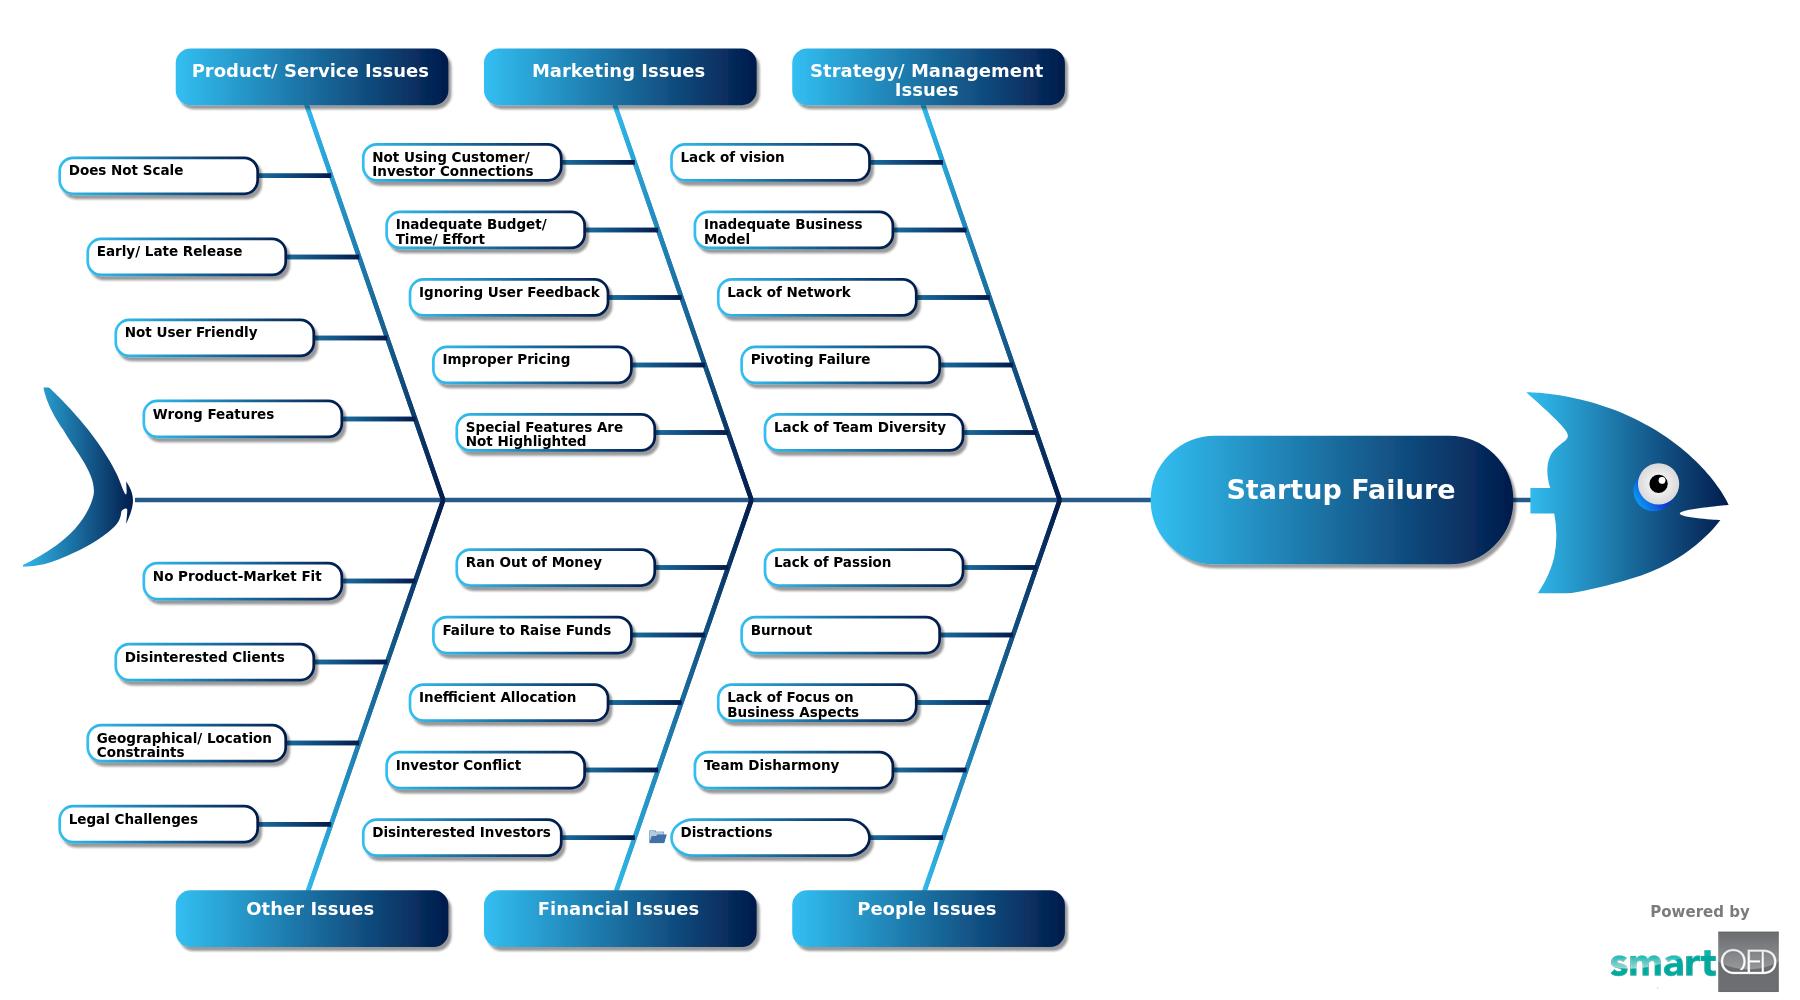 Startup Business Failure